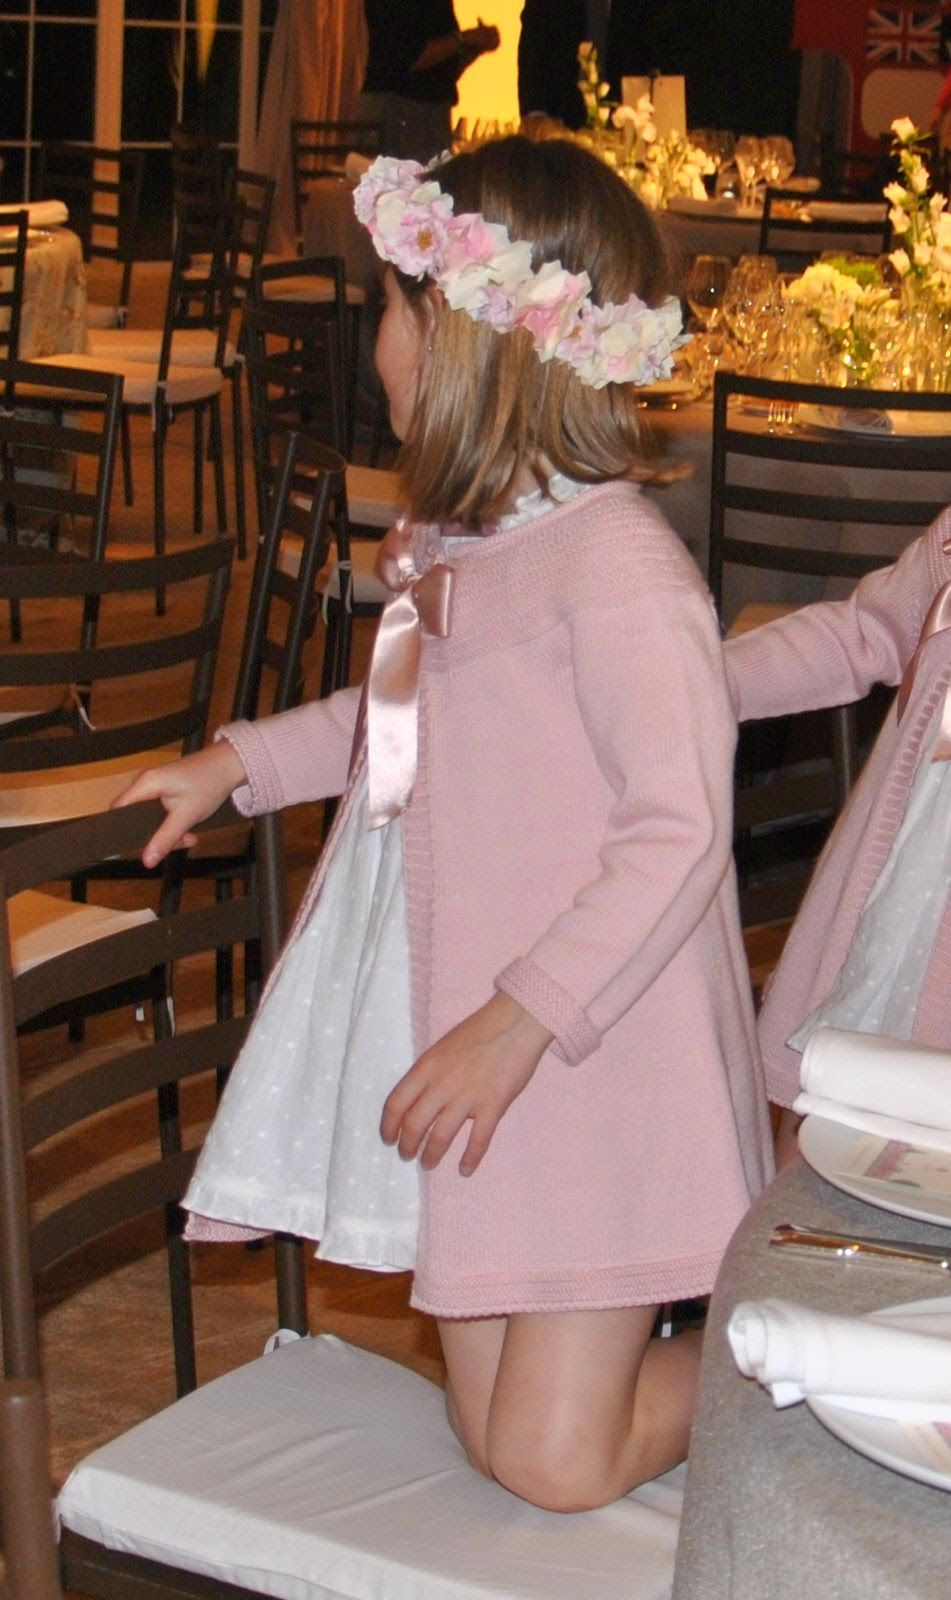 carmentaberner #lacasitademitosroca | ARRAS | Pinterest | Moda niños ...